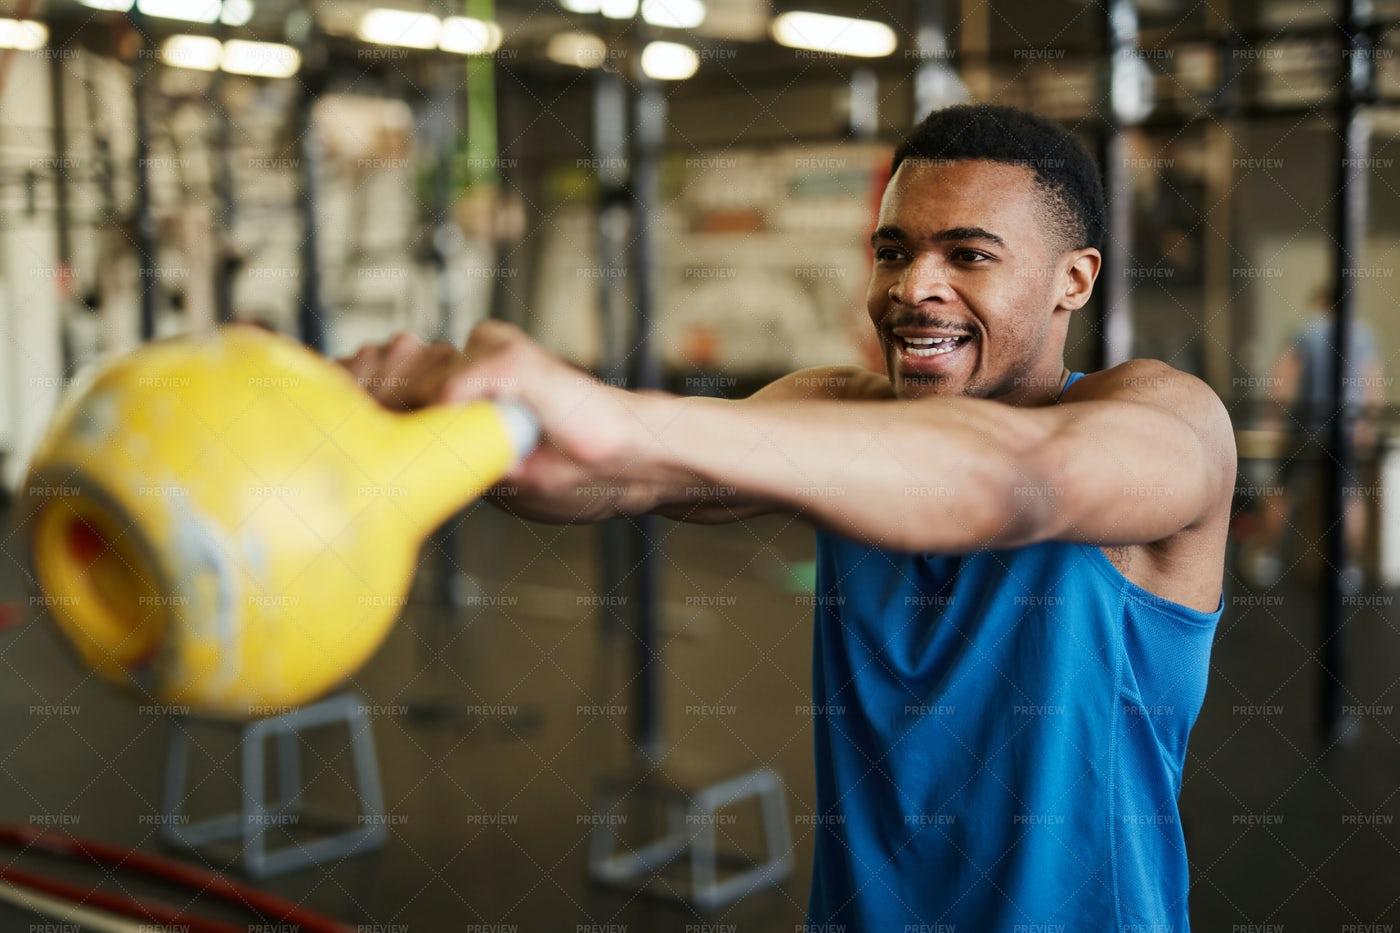 Strong Man Swinging Kettlebell: Stock Photos